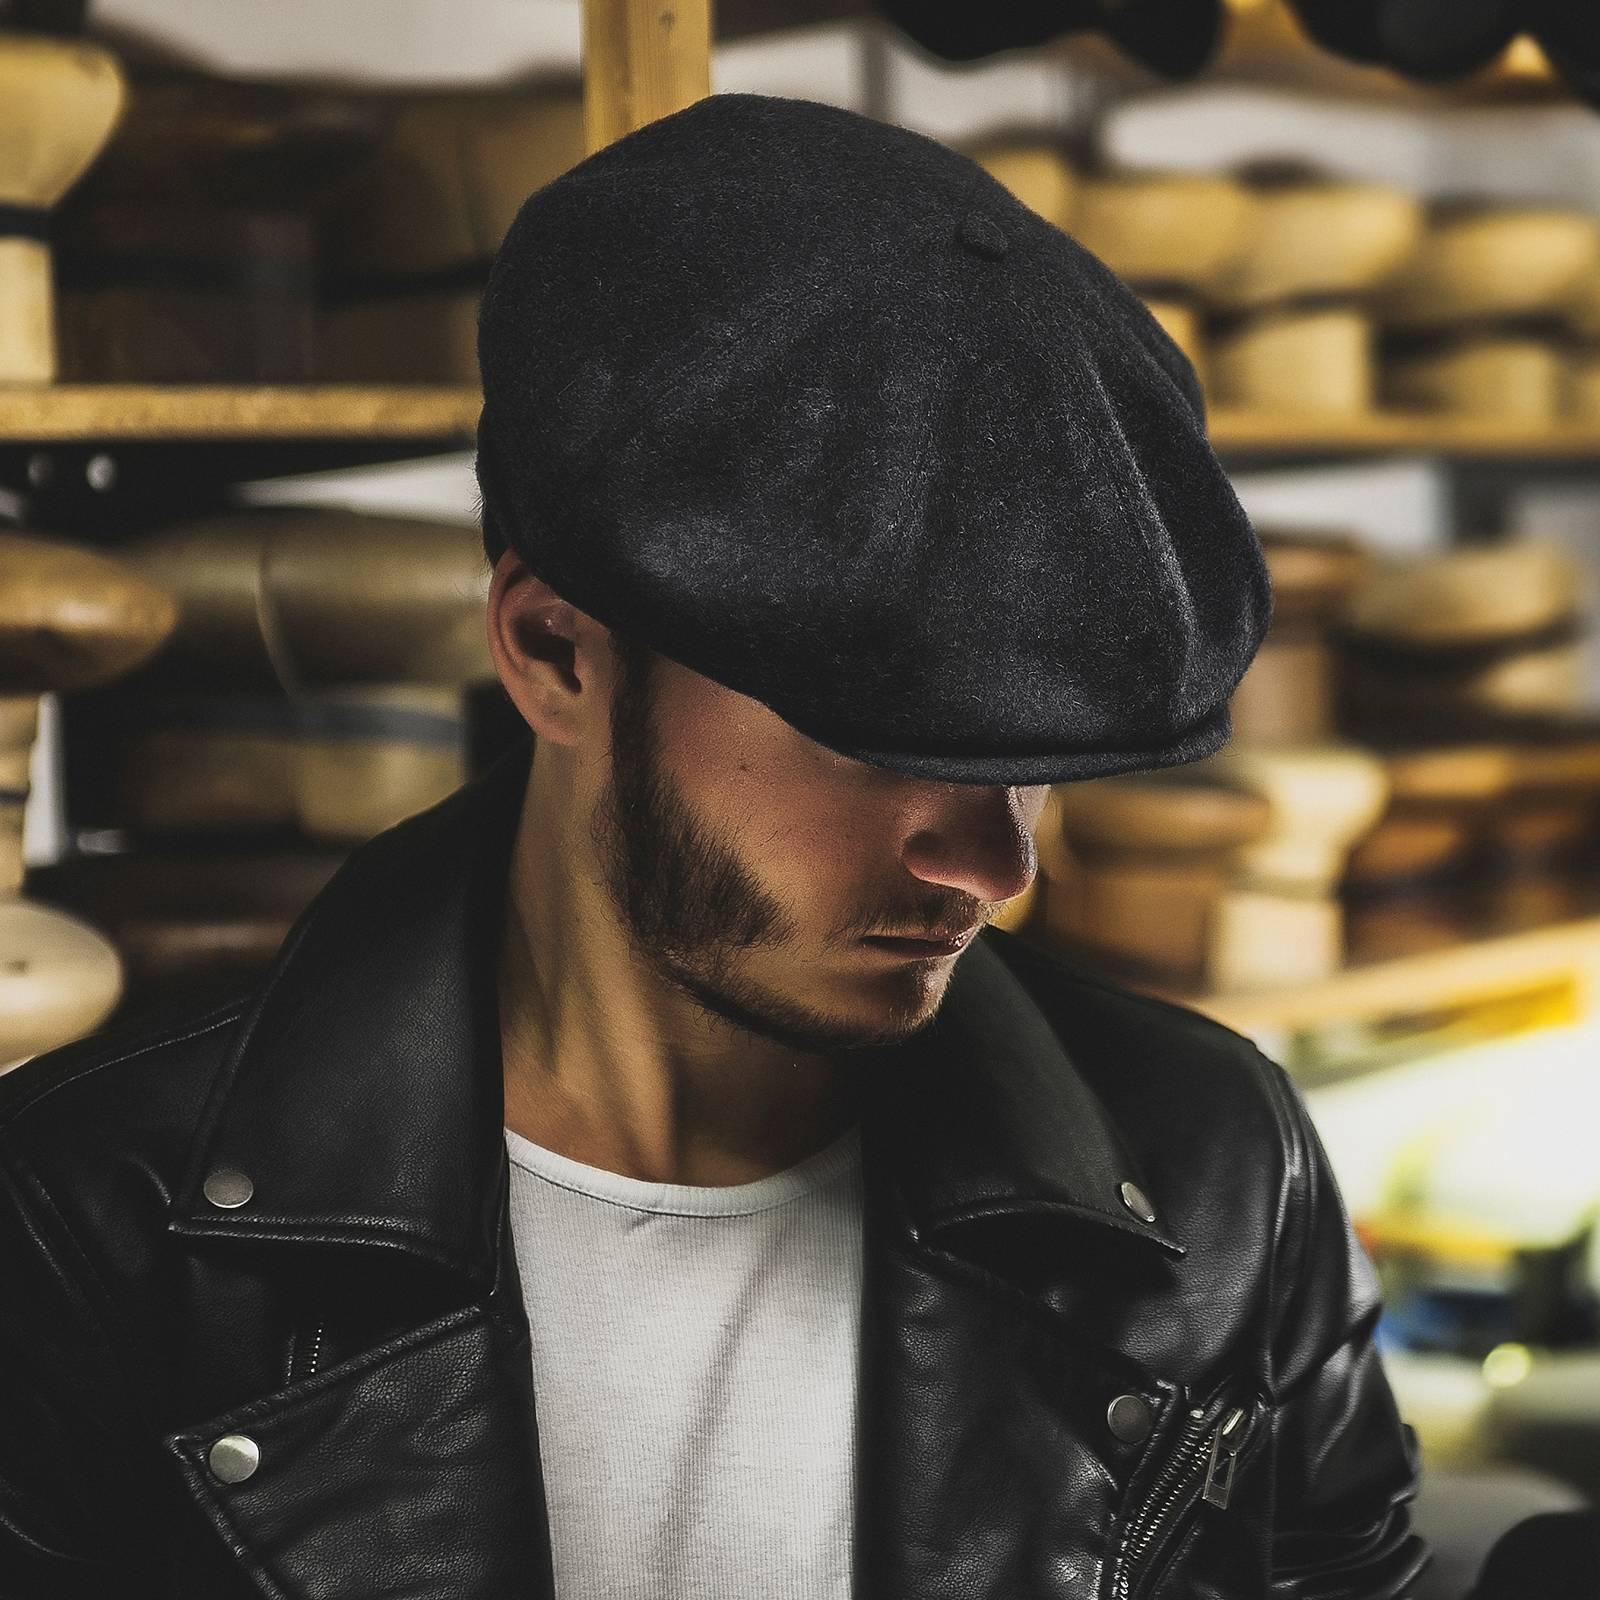 Wool 8 panels newsboy apple peaky blinders cap bandit hooligan ivy league Shelby large hat Gatsby baker boy paper boy